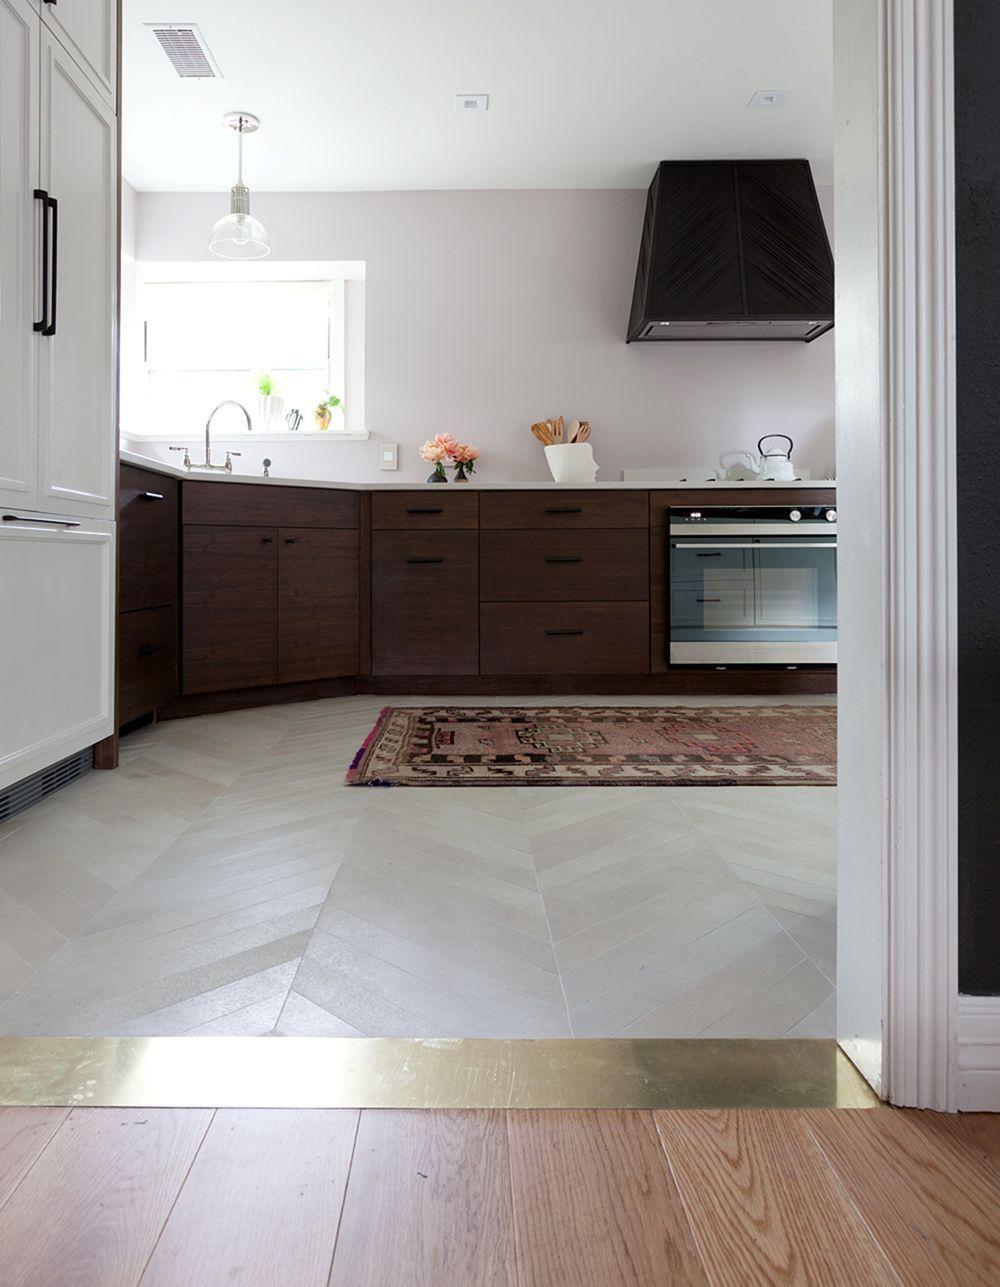 Awesome 50 Best Engineered Wood Flooring Design Ideas Https Decoredo Com 10922 50 Best Engineered Wo Floor Design Engineered Wood Floors Trendy Kitchen Tile